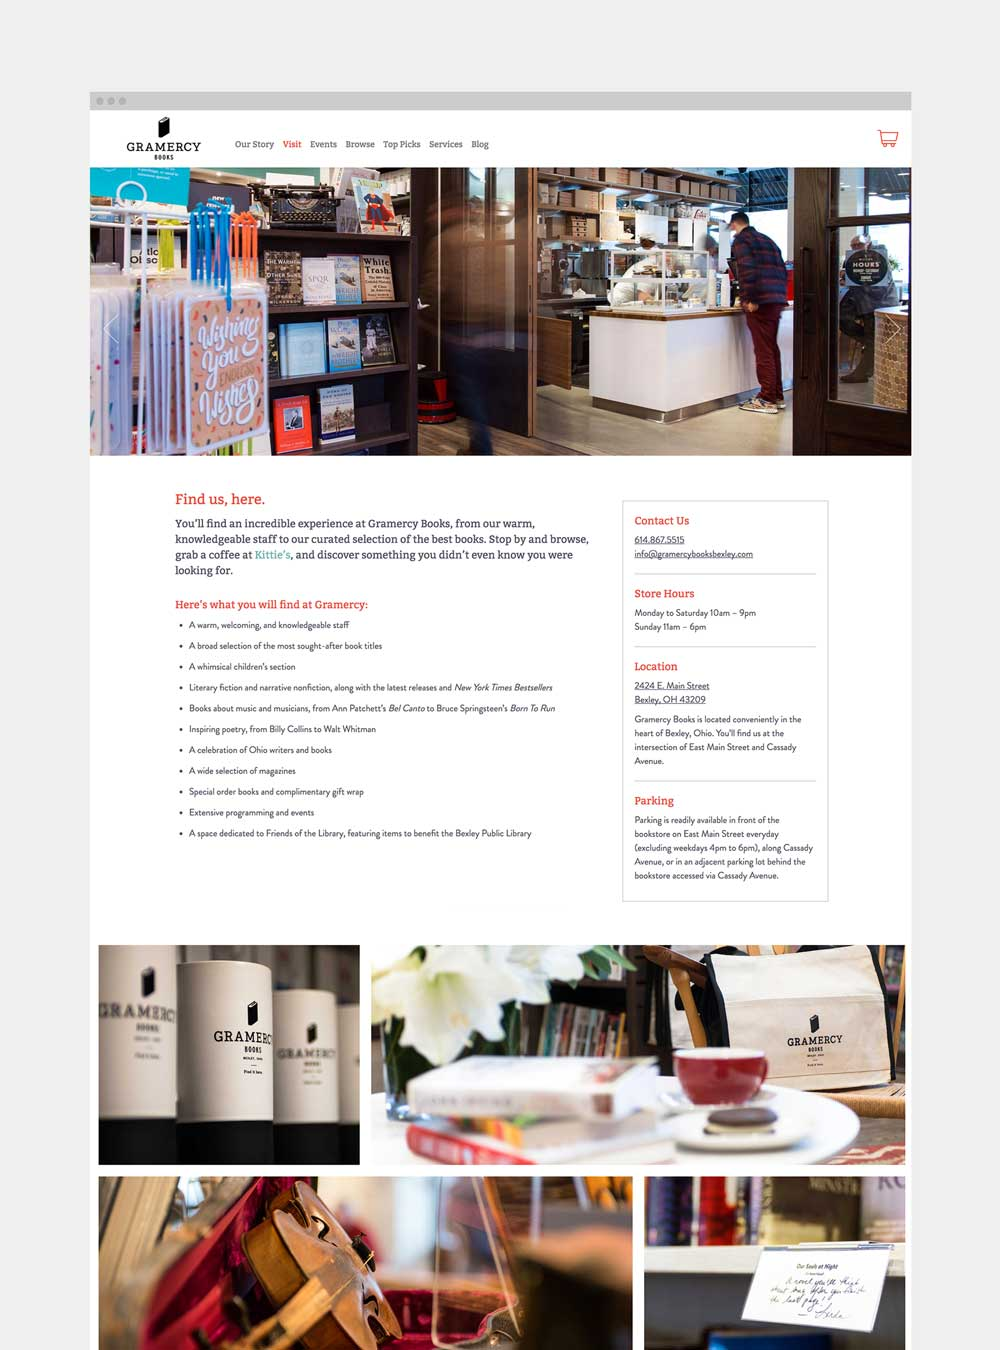 cheers-studios-gramercy-books-bexley-columbus-ohio-website-visit-page-design3.jpg